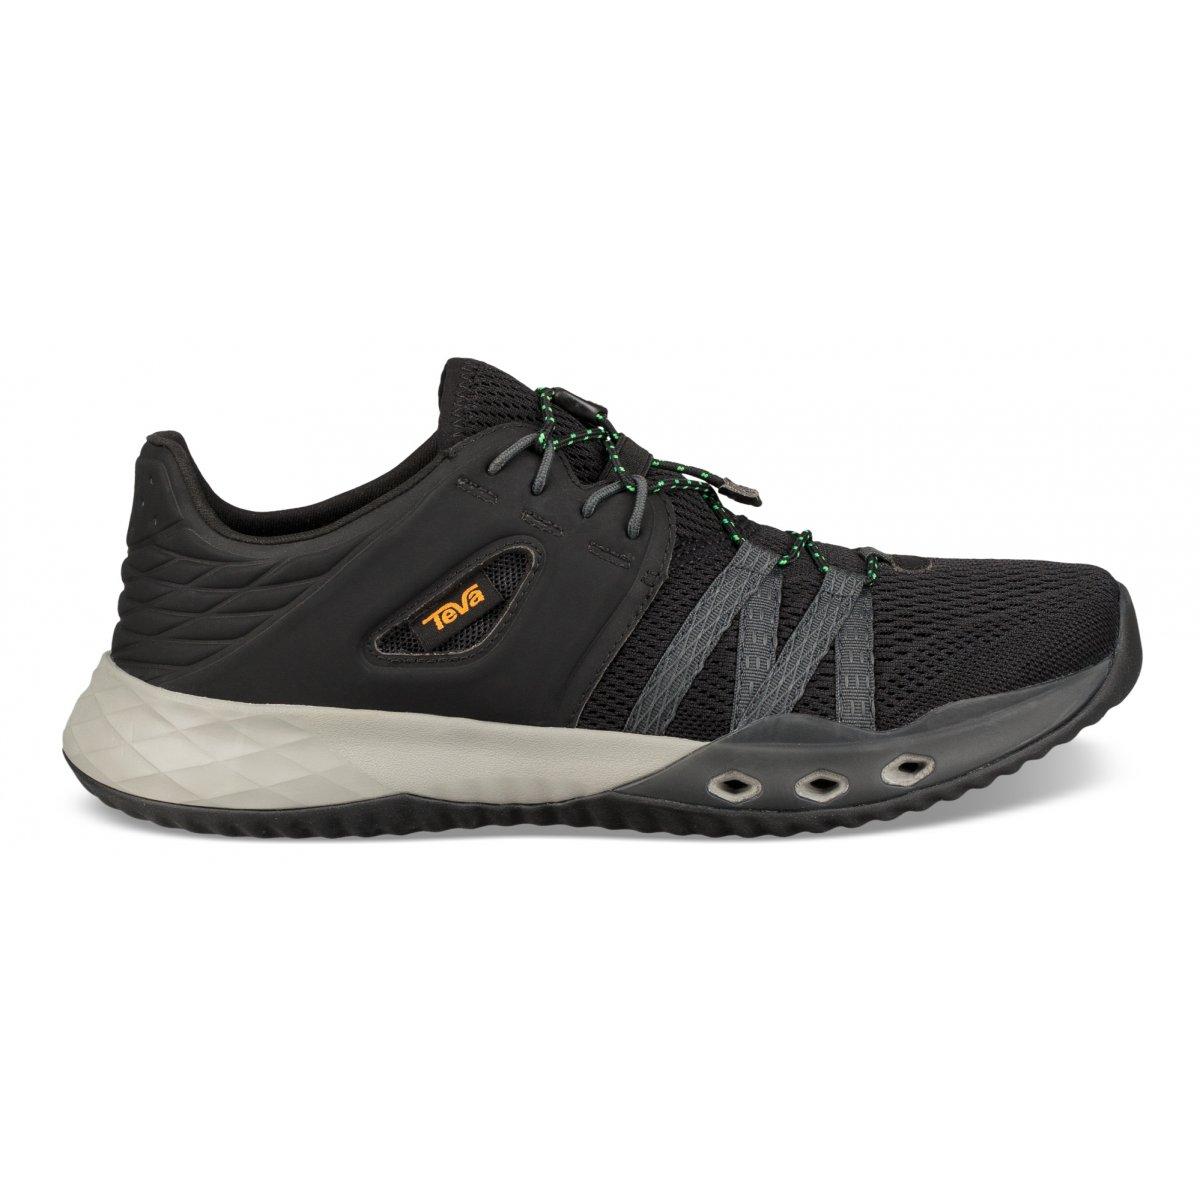 UomoTeva® M Primaveraestate Footwear Terra Churn Float Scarpa FKJl1c